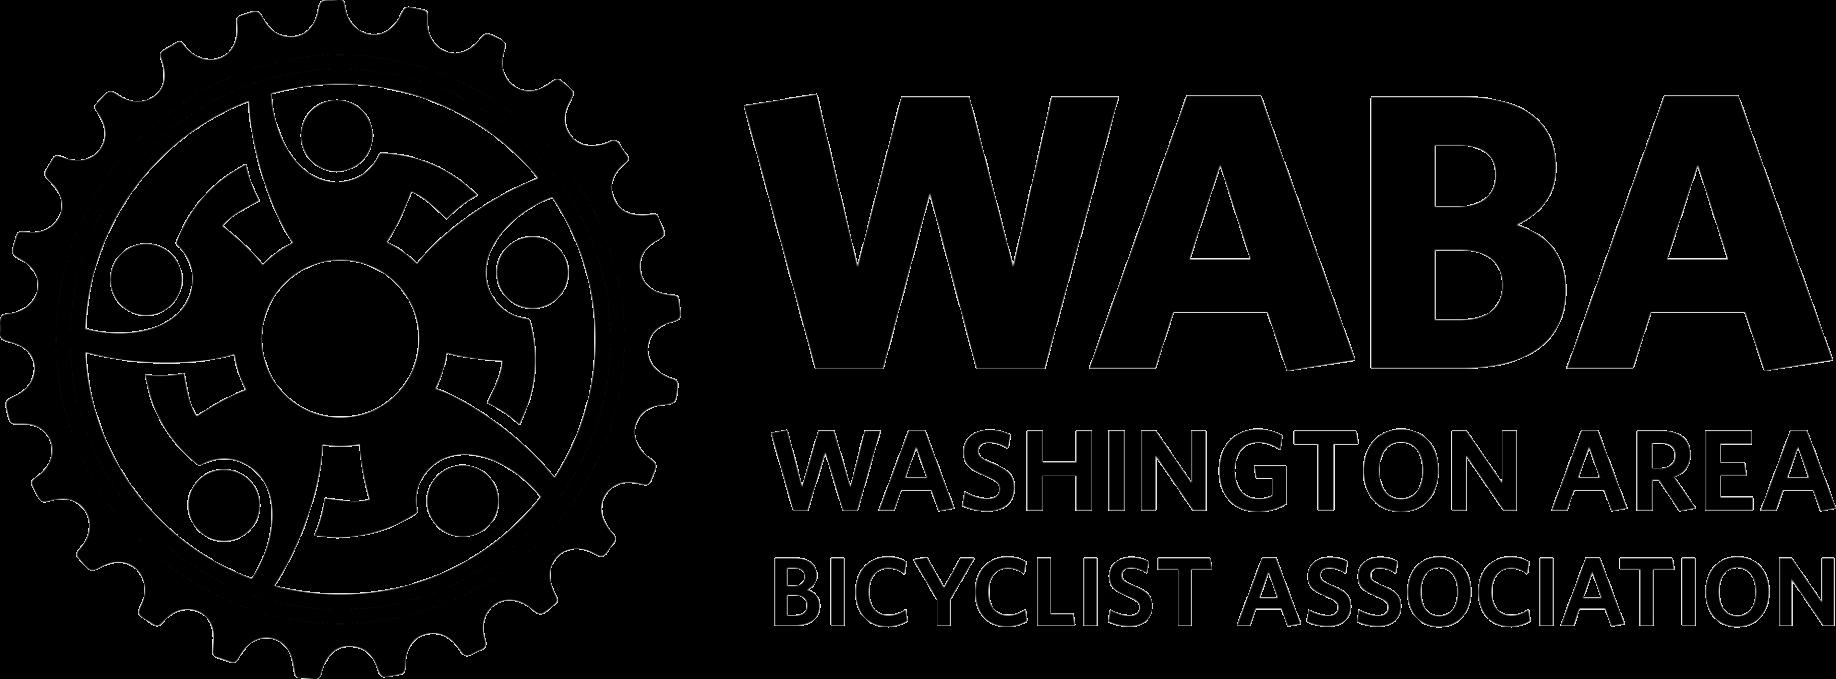 Washington Area Bicyclists Association (WABA)